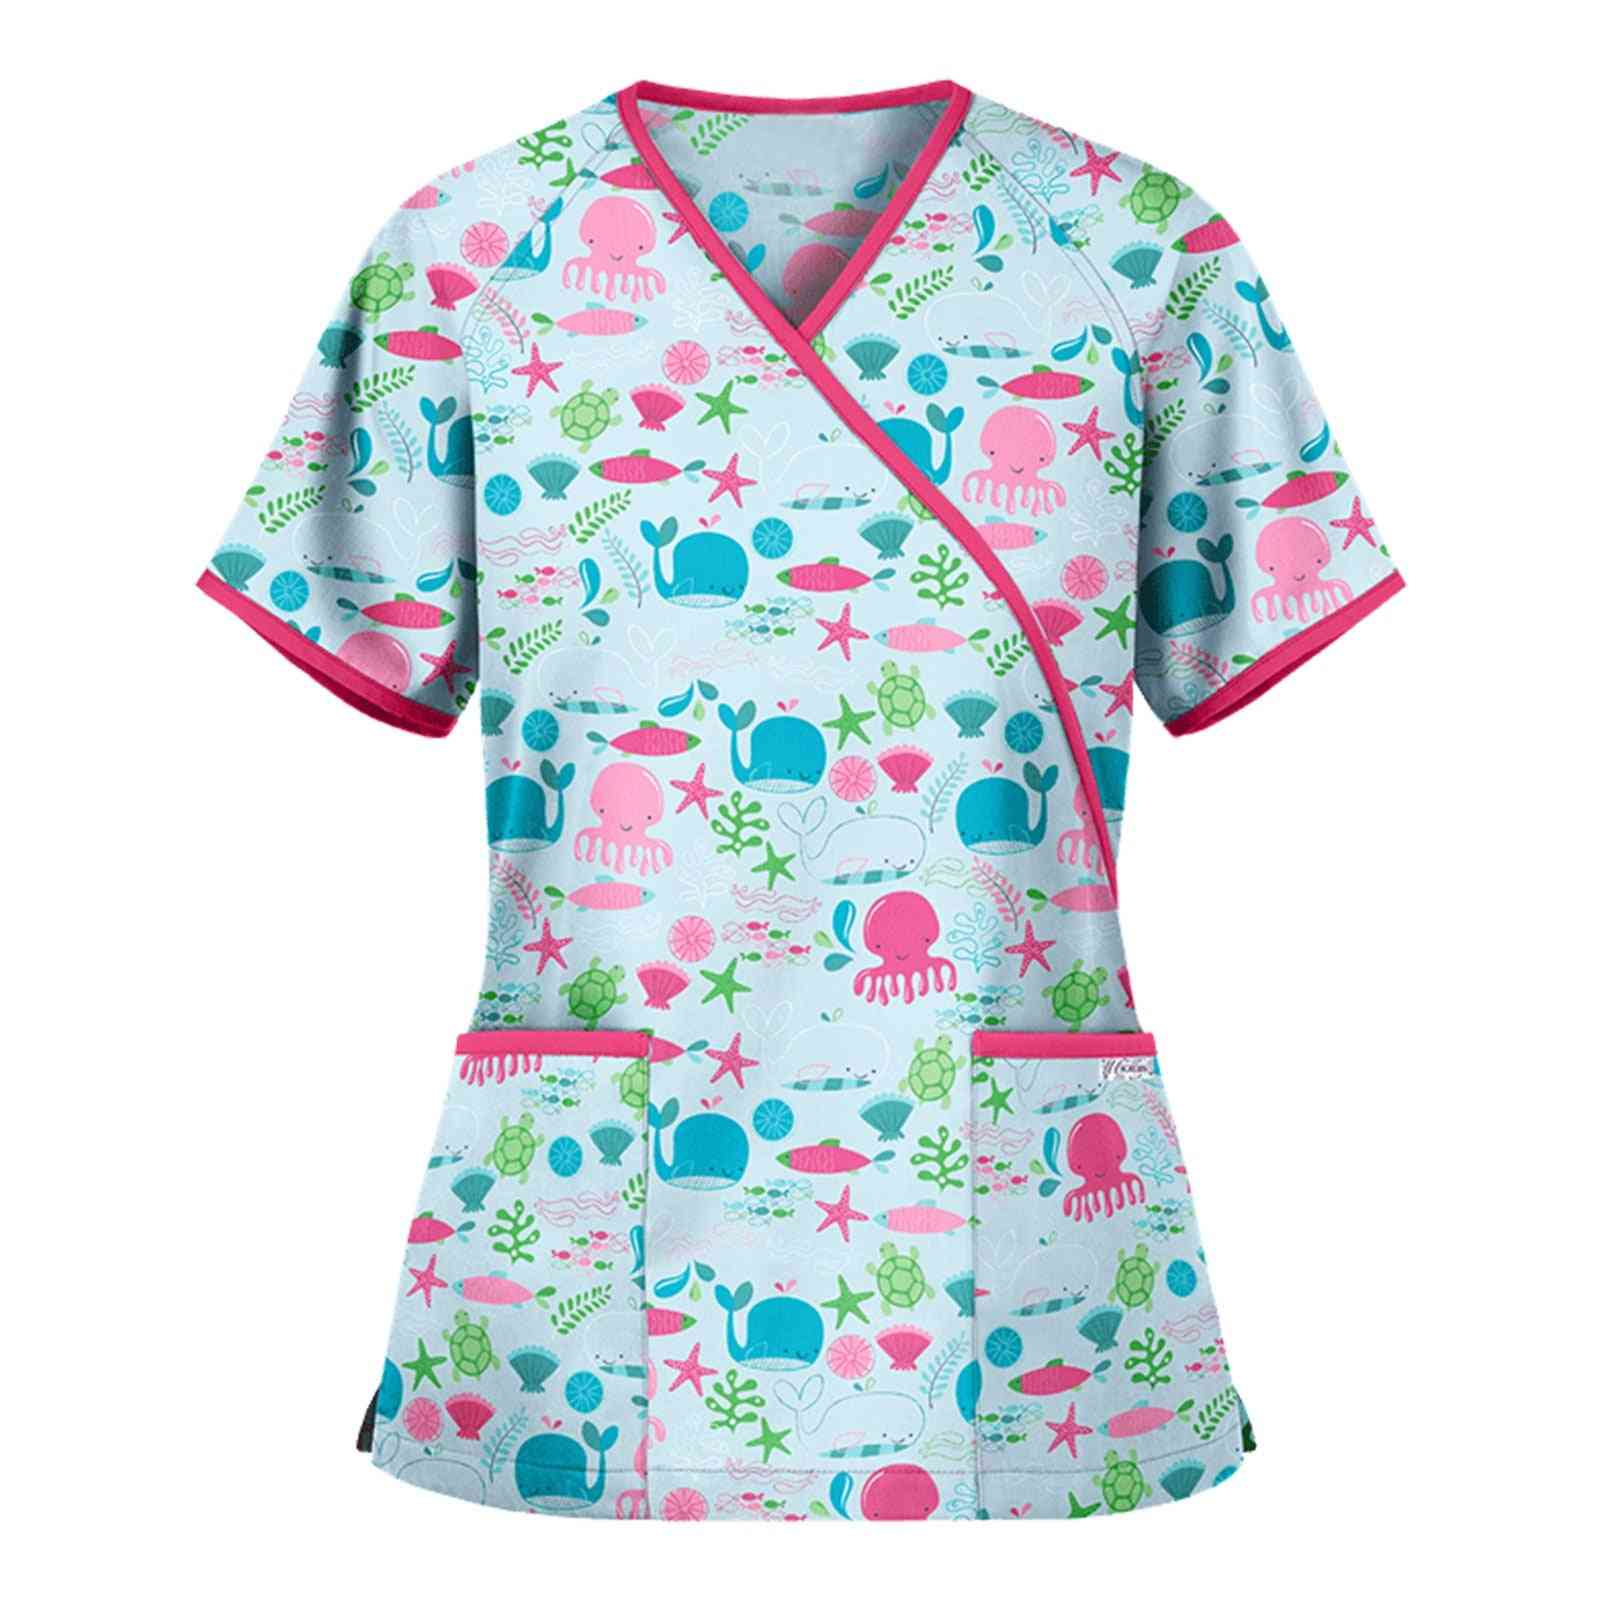 Nurse Uniform, Animal Print Sexy V-neck Uniform